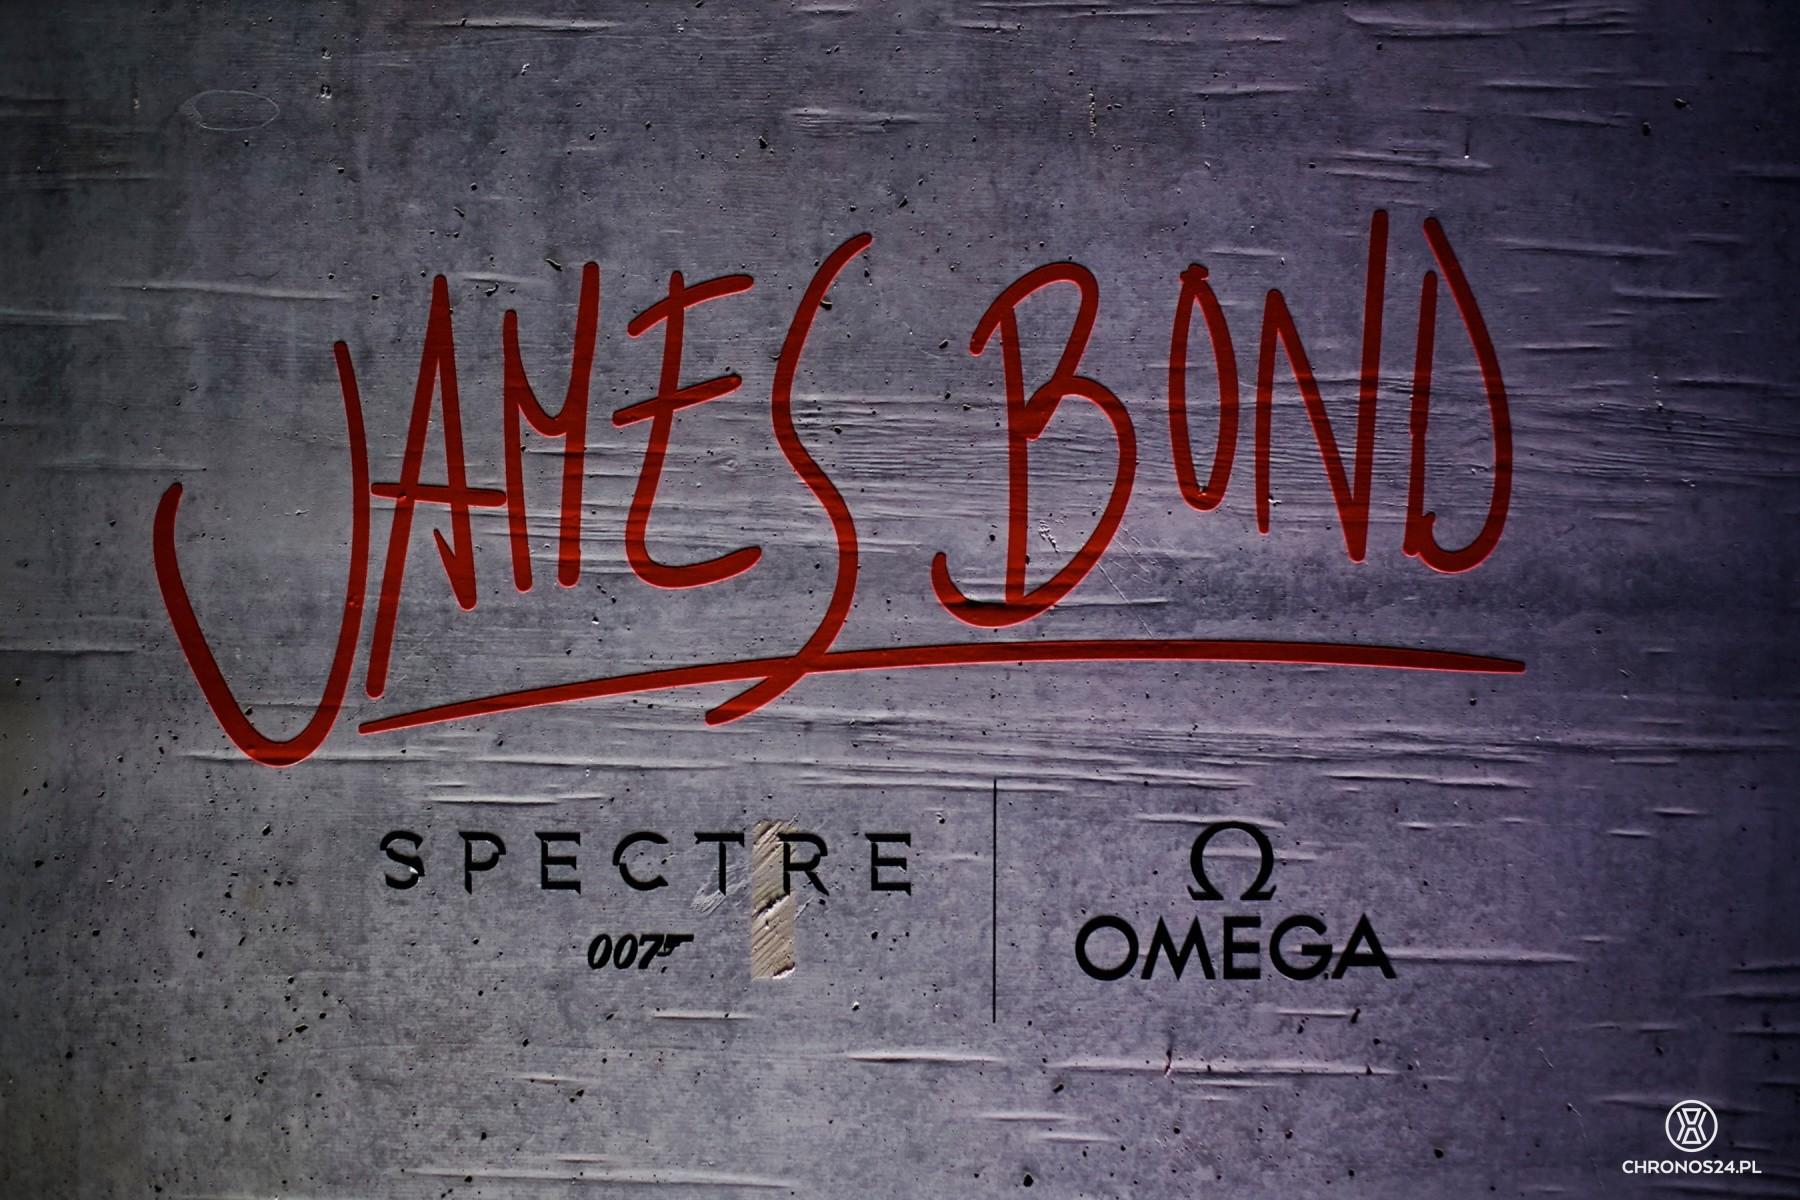 Omega & James Bond party